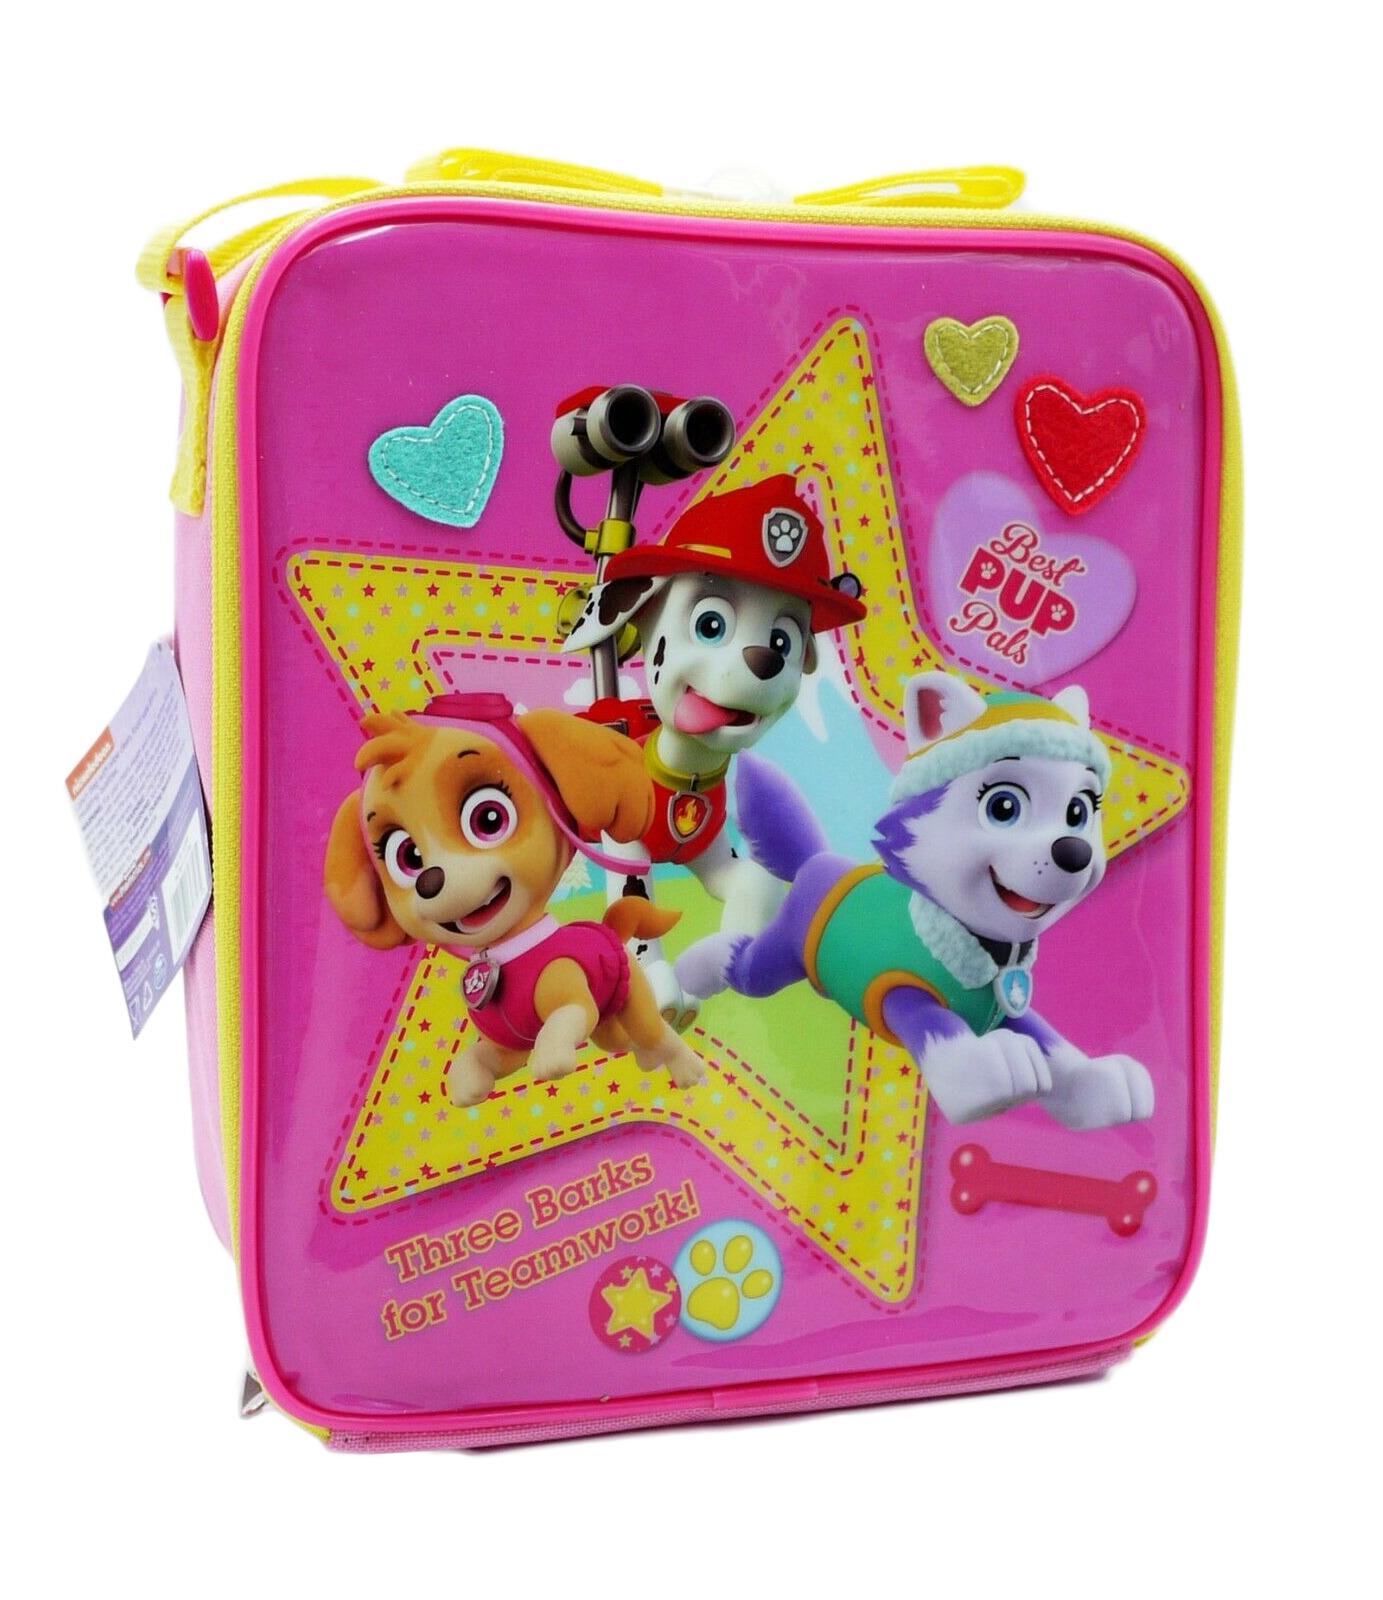 Nickelodeon Paw Patrol Lunch Bag